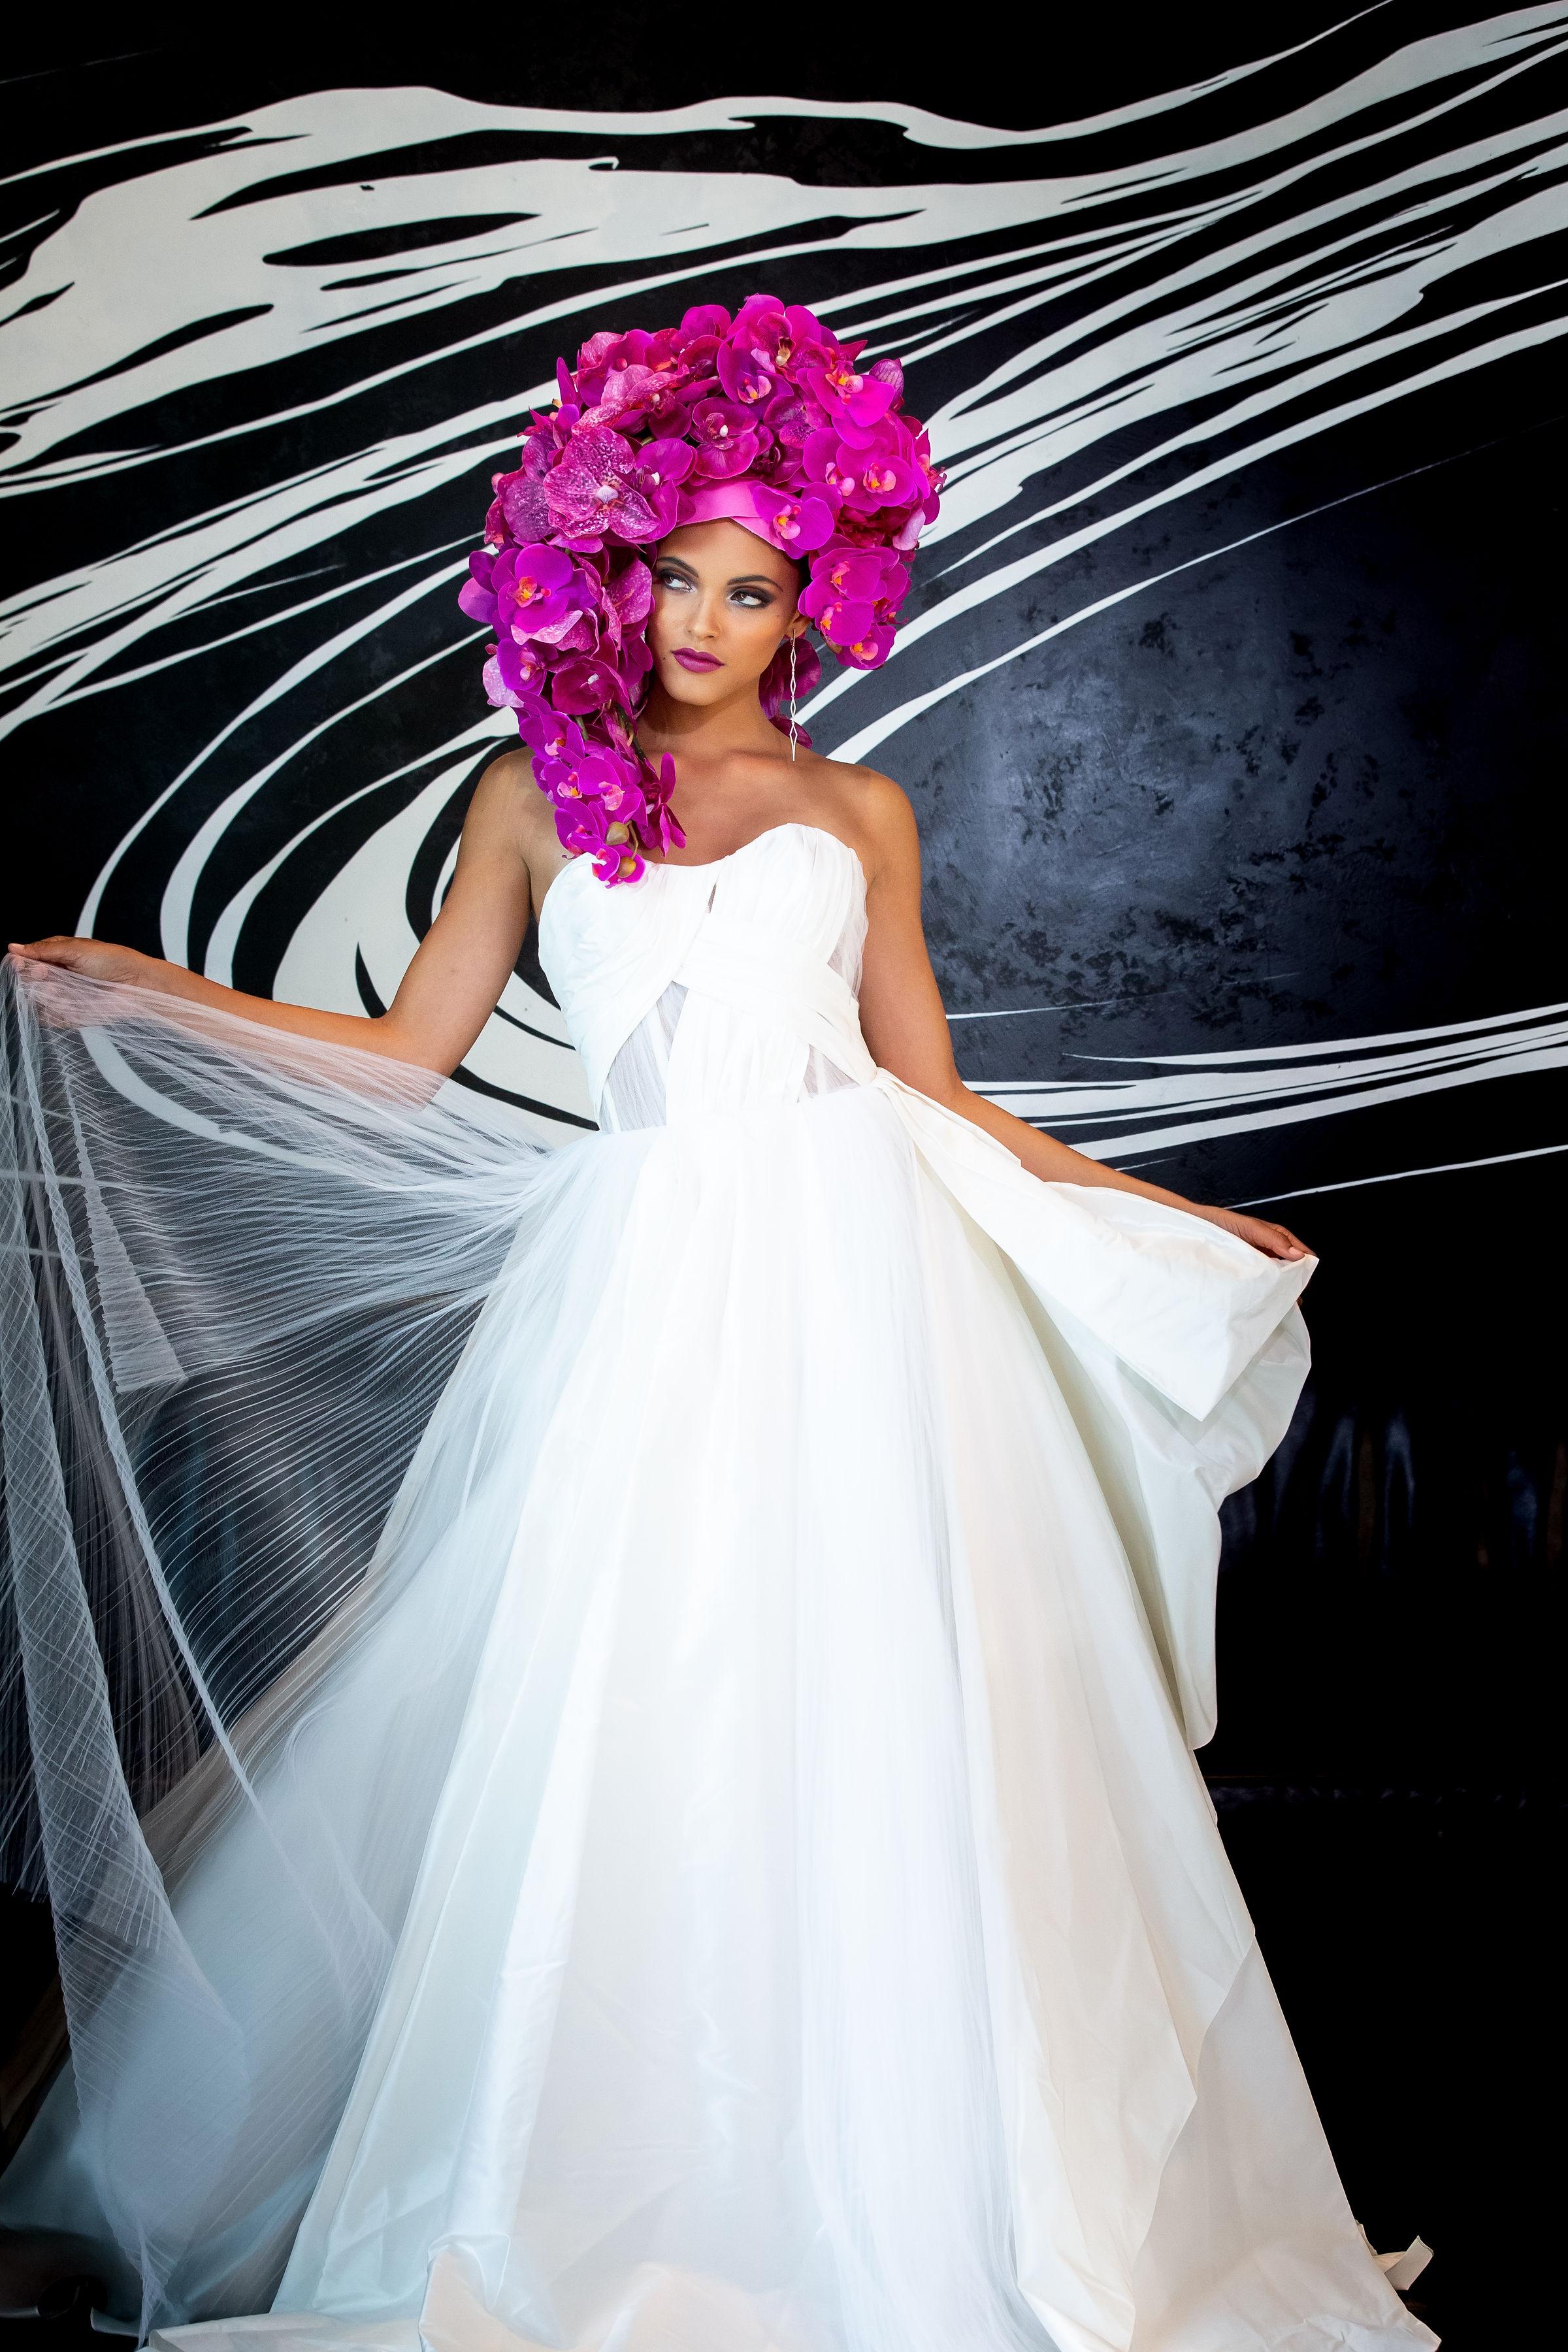 Angel-Sanche-dress-1-4-eyes-photo-005.jpg